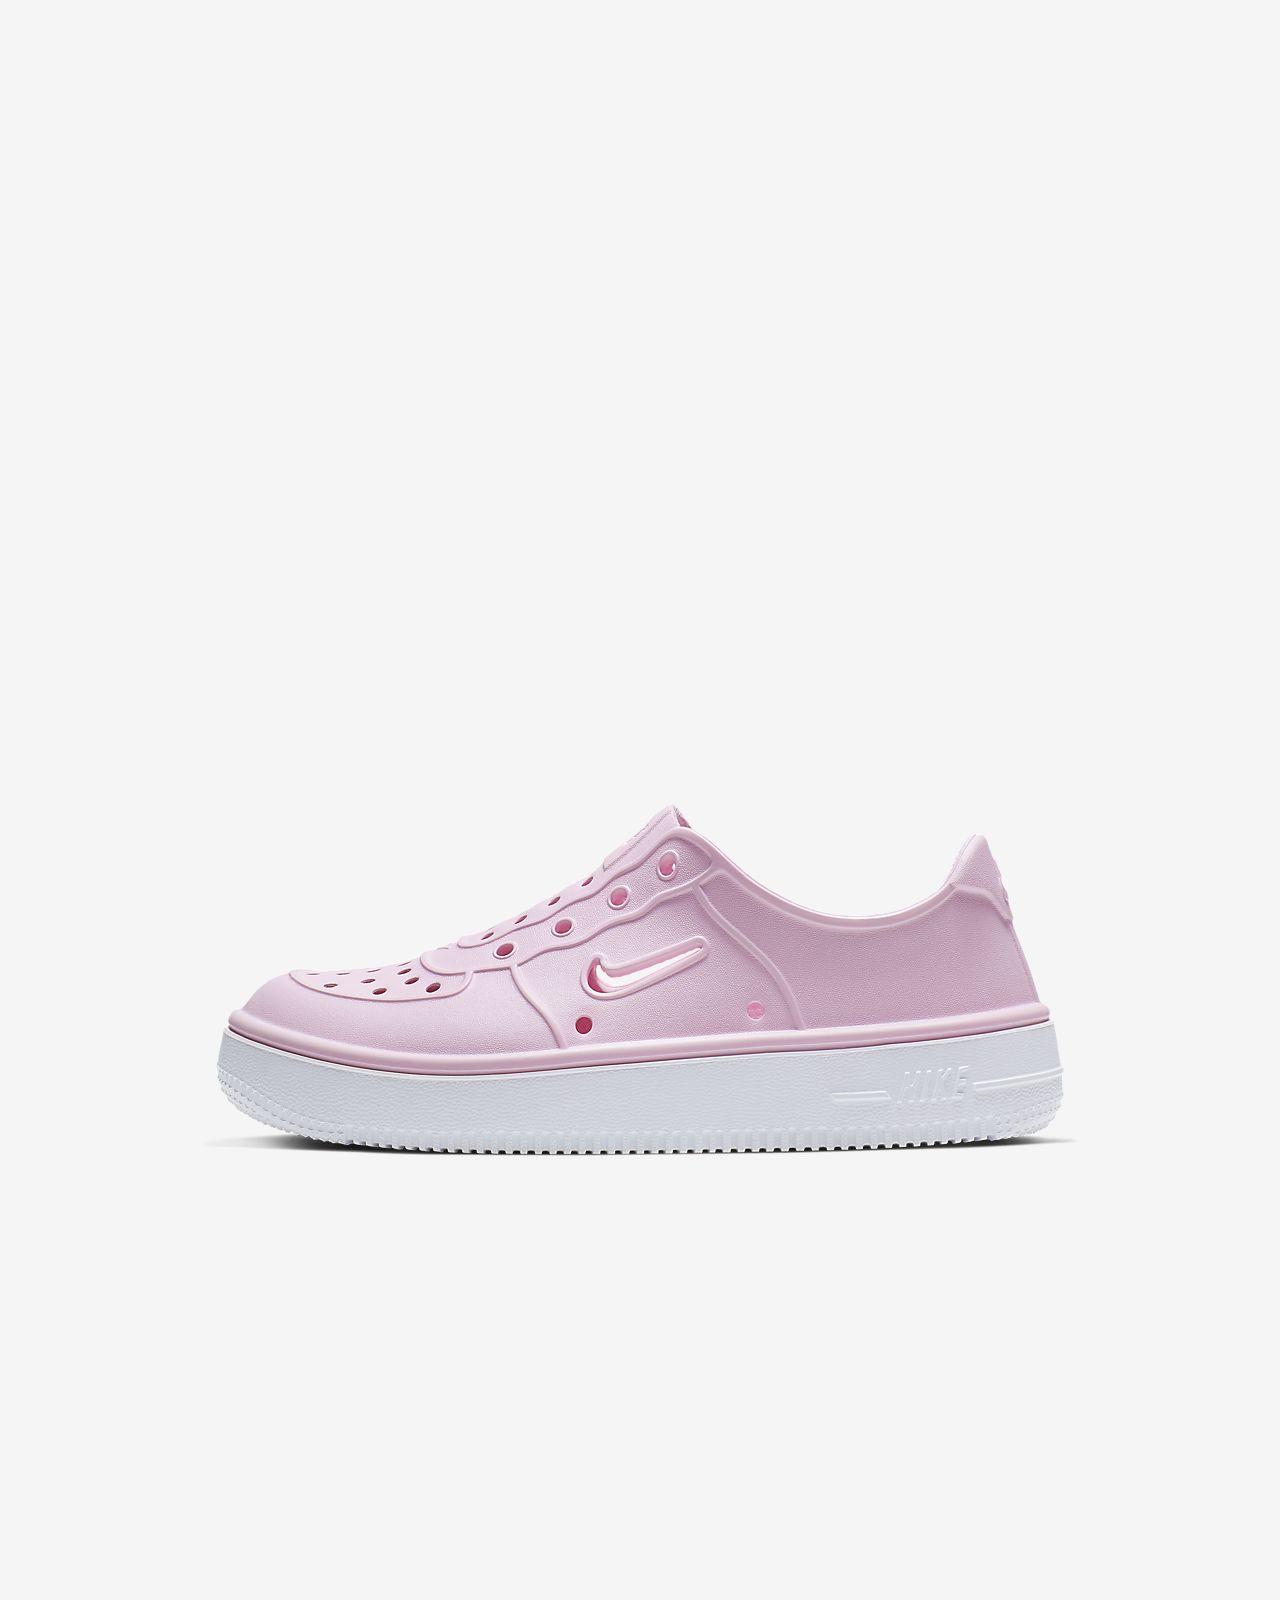 Nike Foam Force 1 Zapatillas - Niño/a pequeño/a